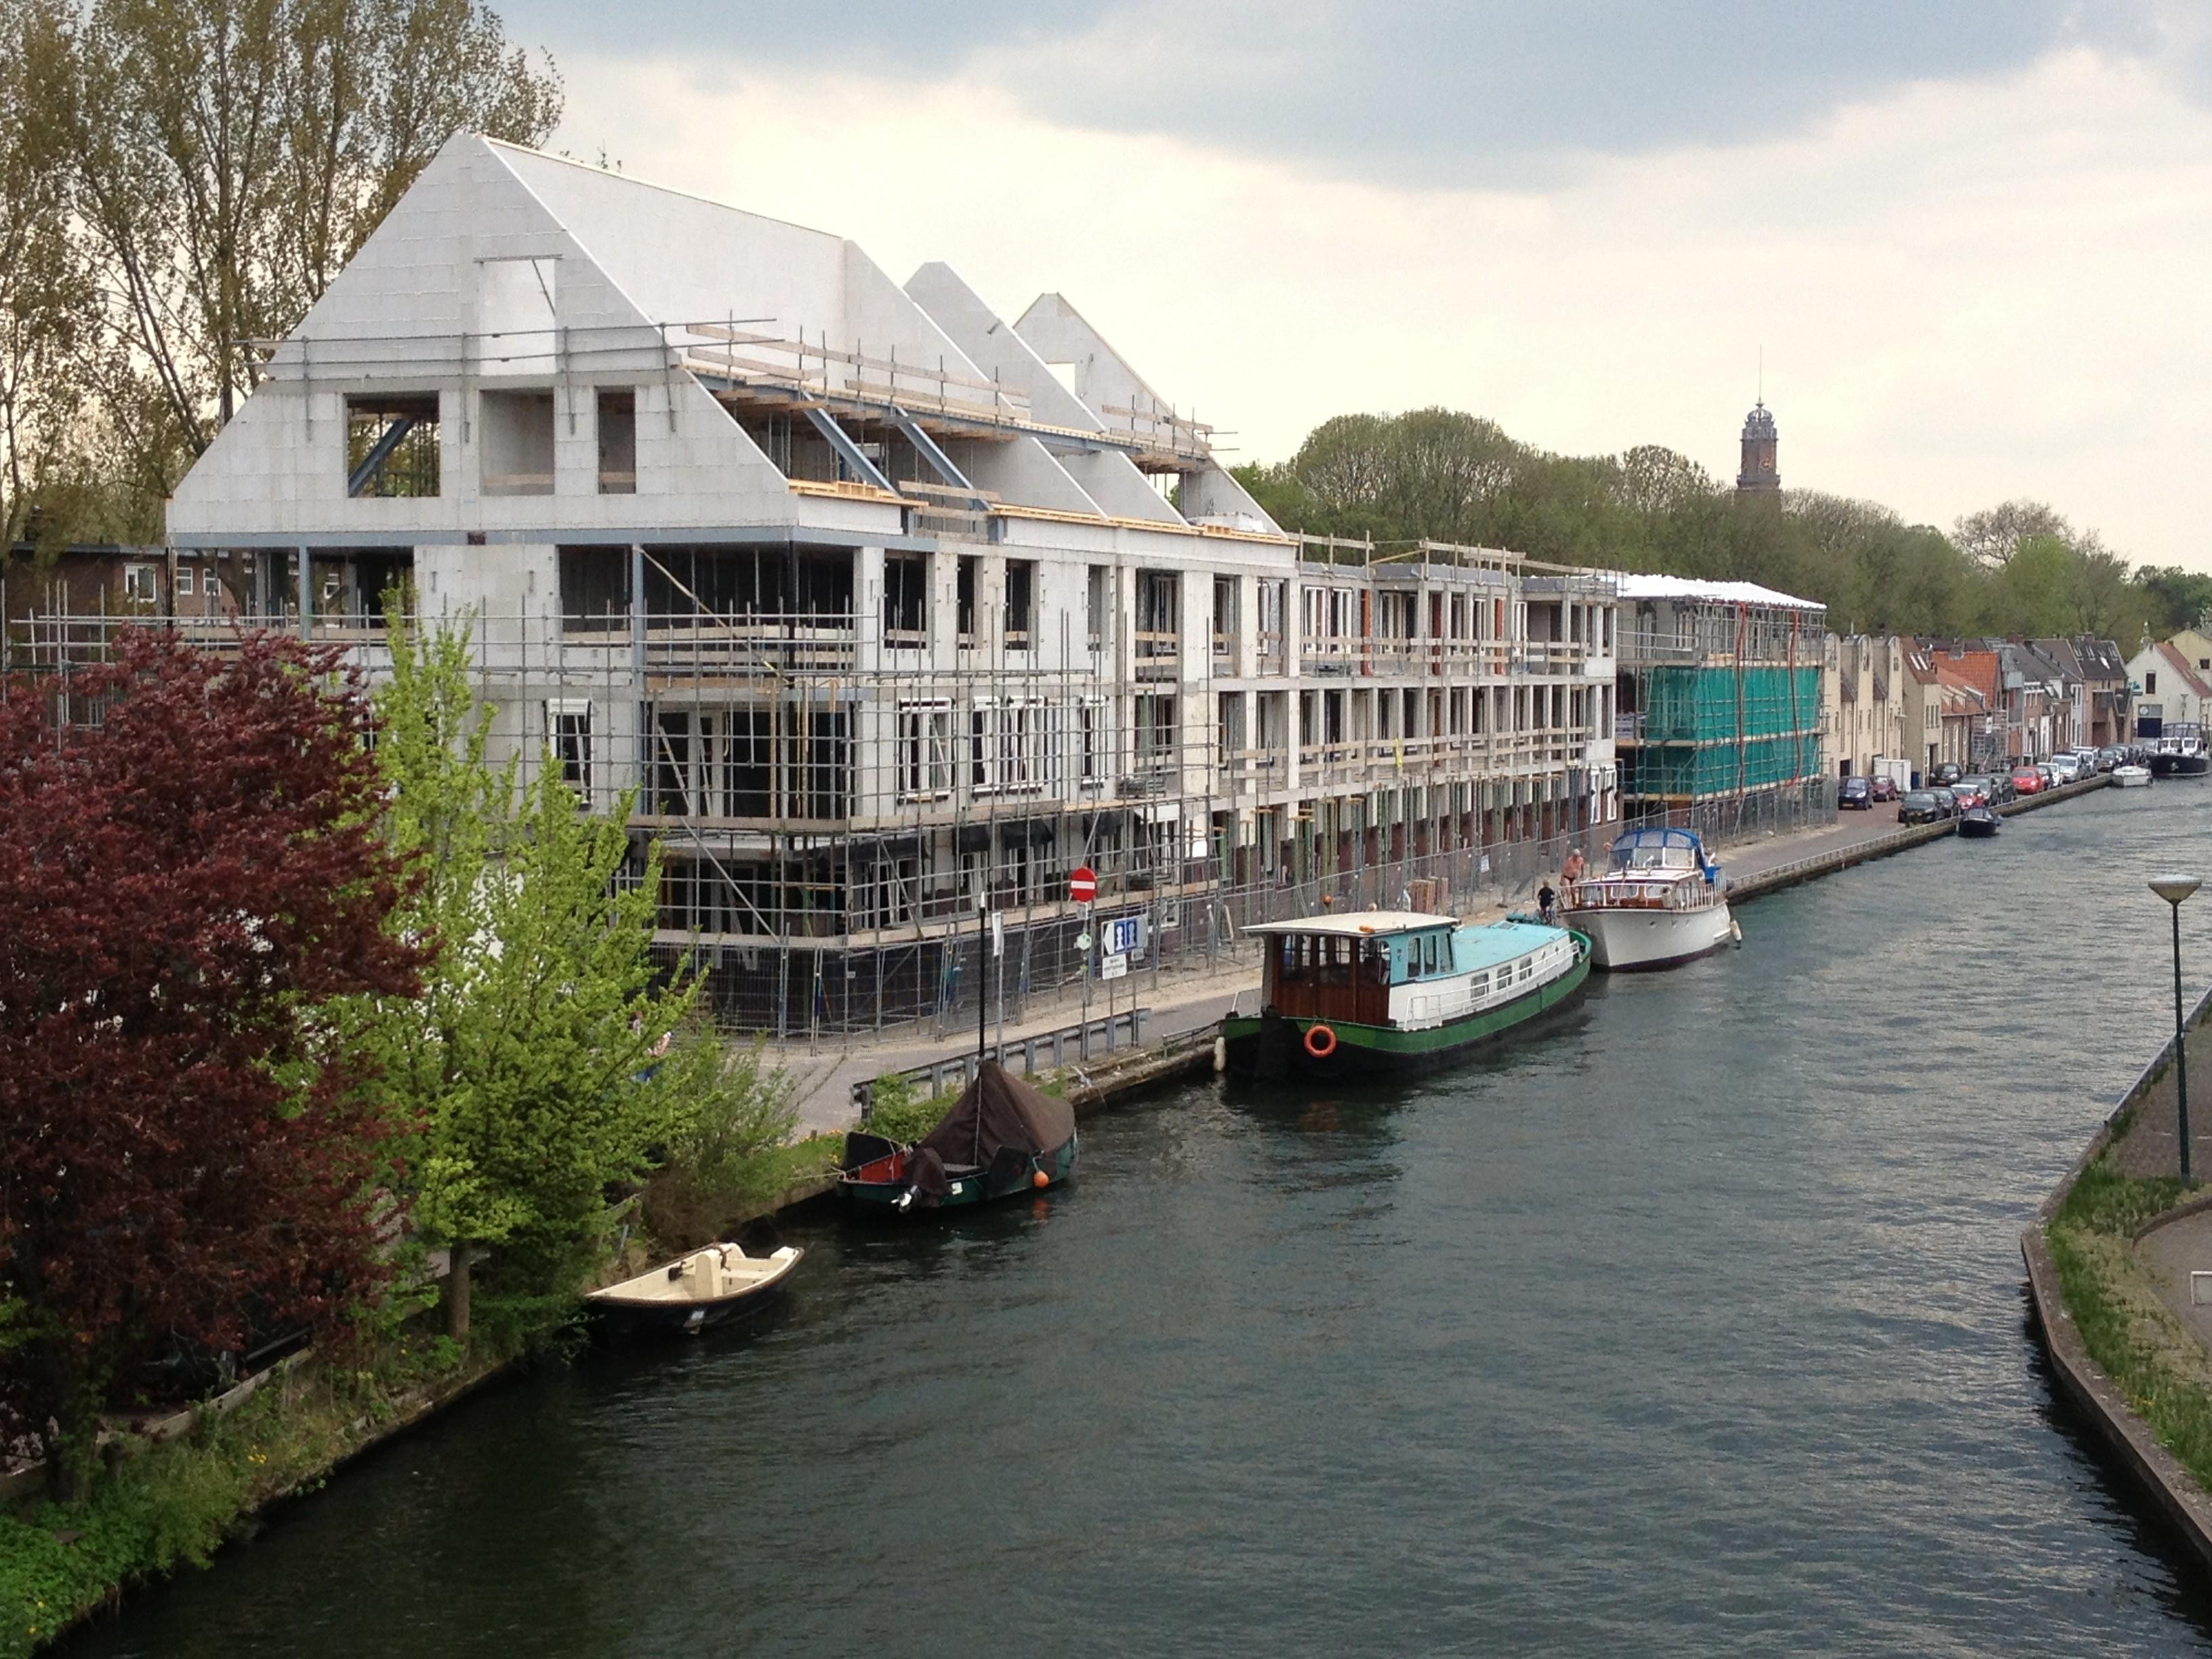 BKT_provides_devriesenverburg_IJsselstein_appartementen_Panoven_parkeerkelder_schuindak_metslwerk_zink_bouwbord_Cubord_Esbi_08.jpg